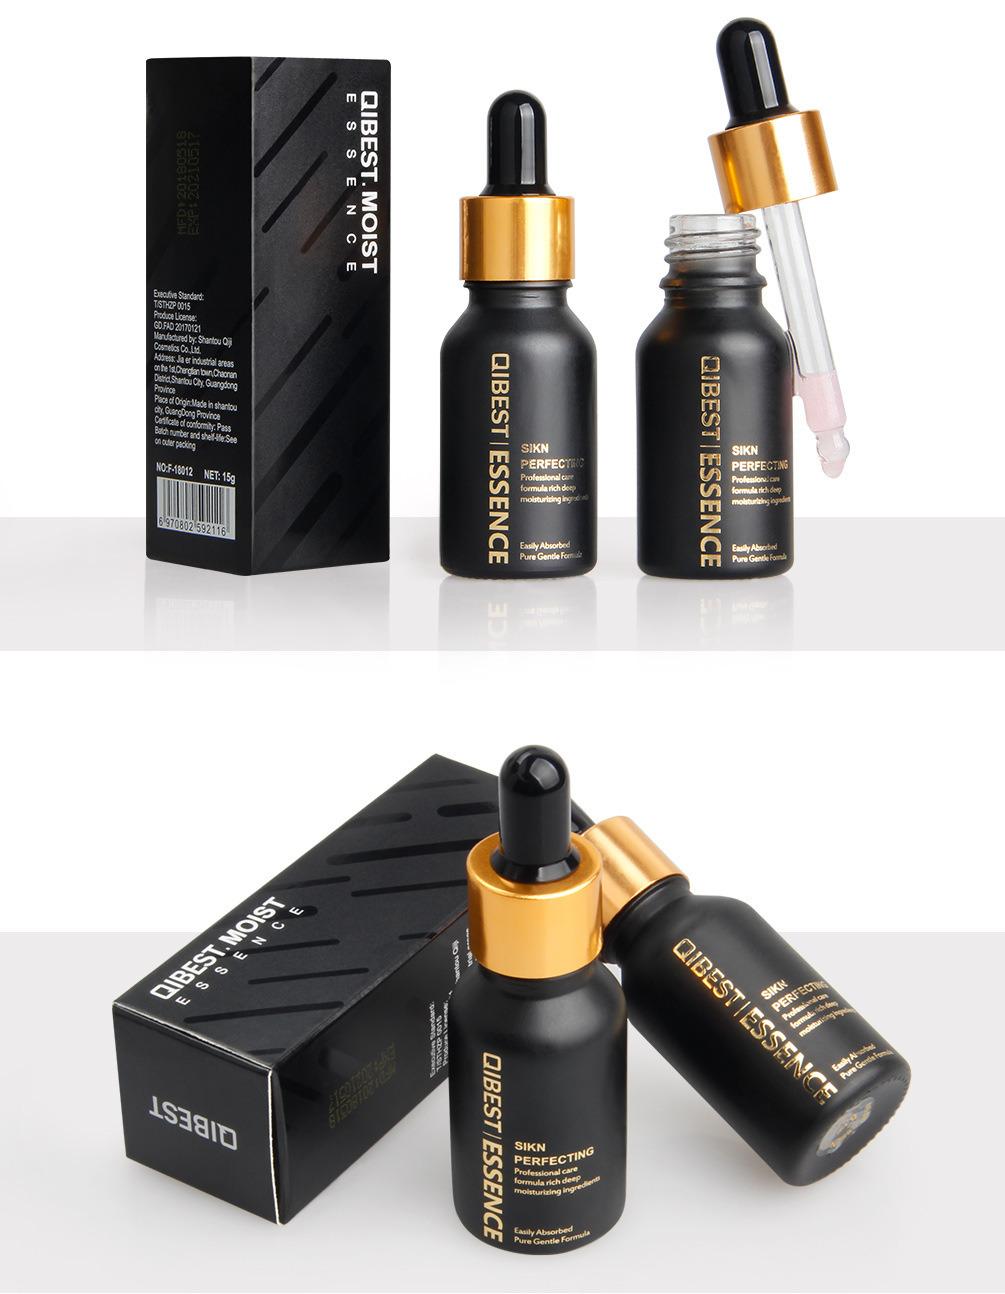 China 24K Gold Foil Moisturizing Makeup Essence Eye Lip